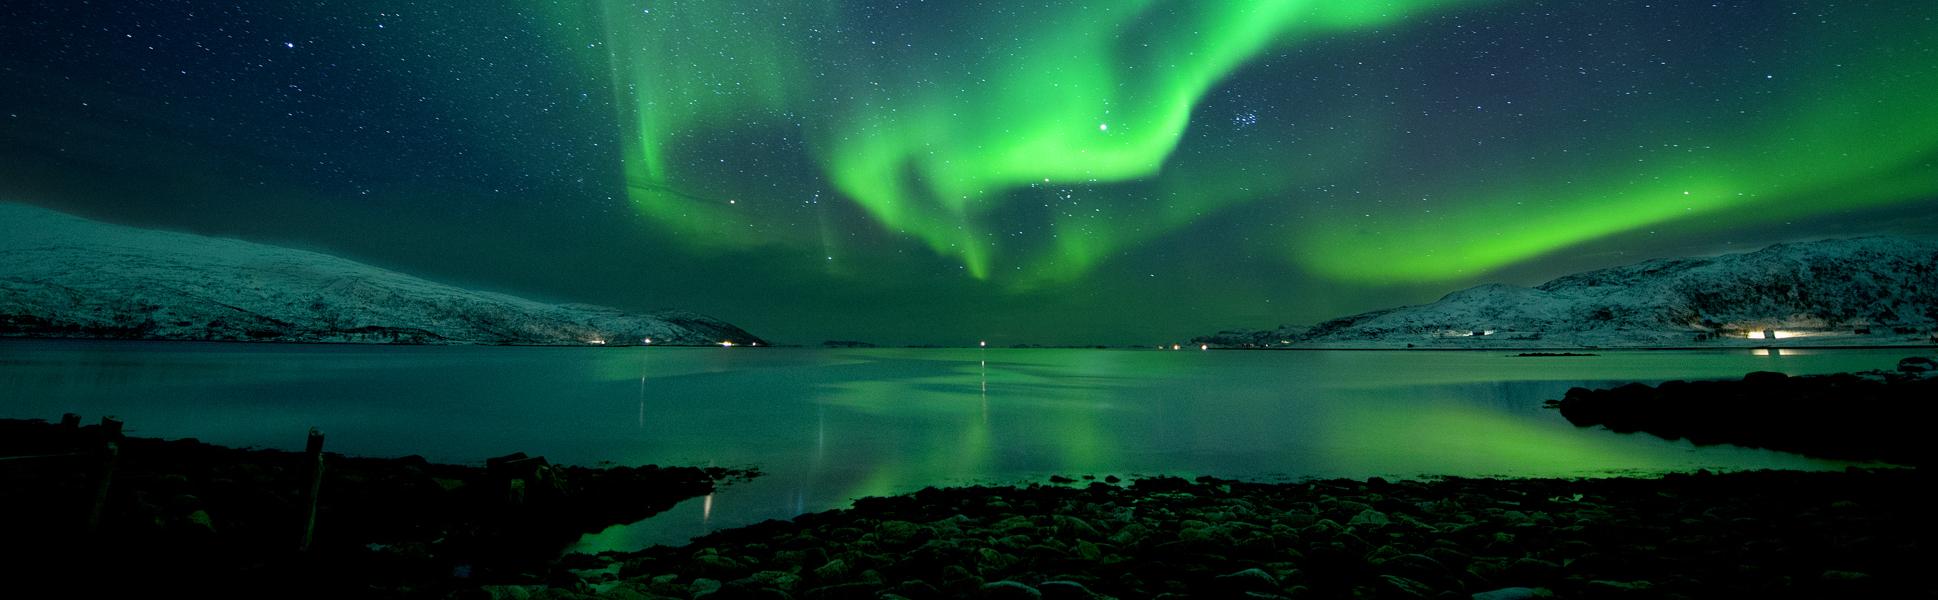 night-3_banner.jpg